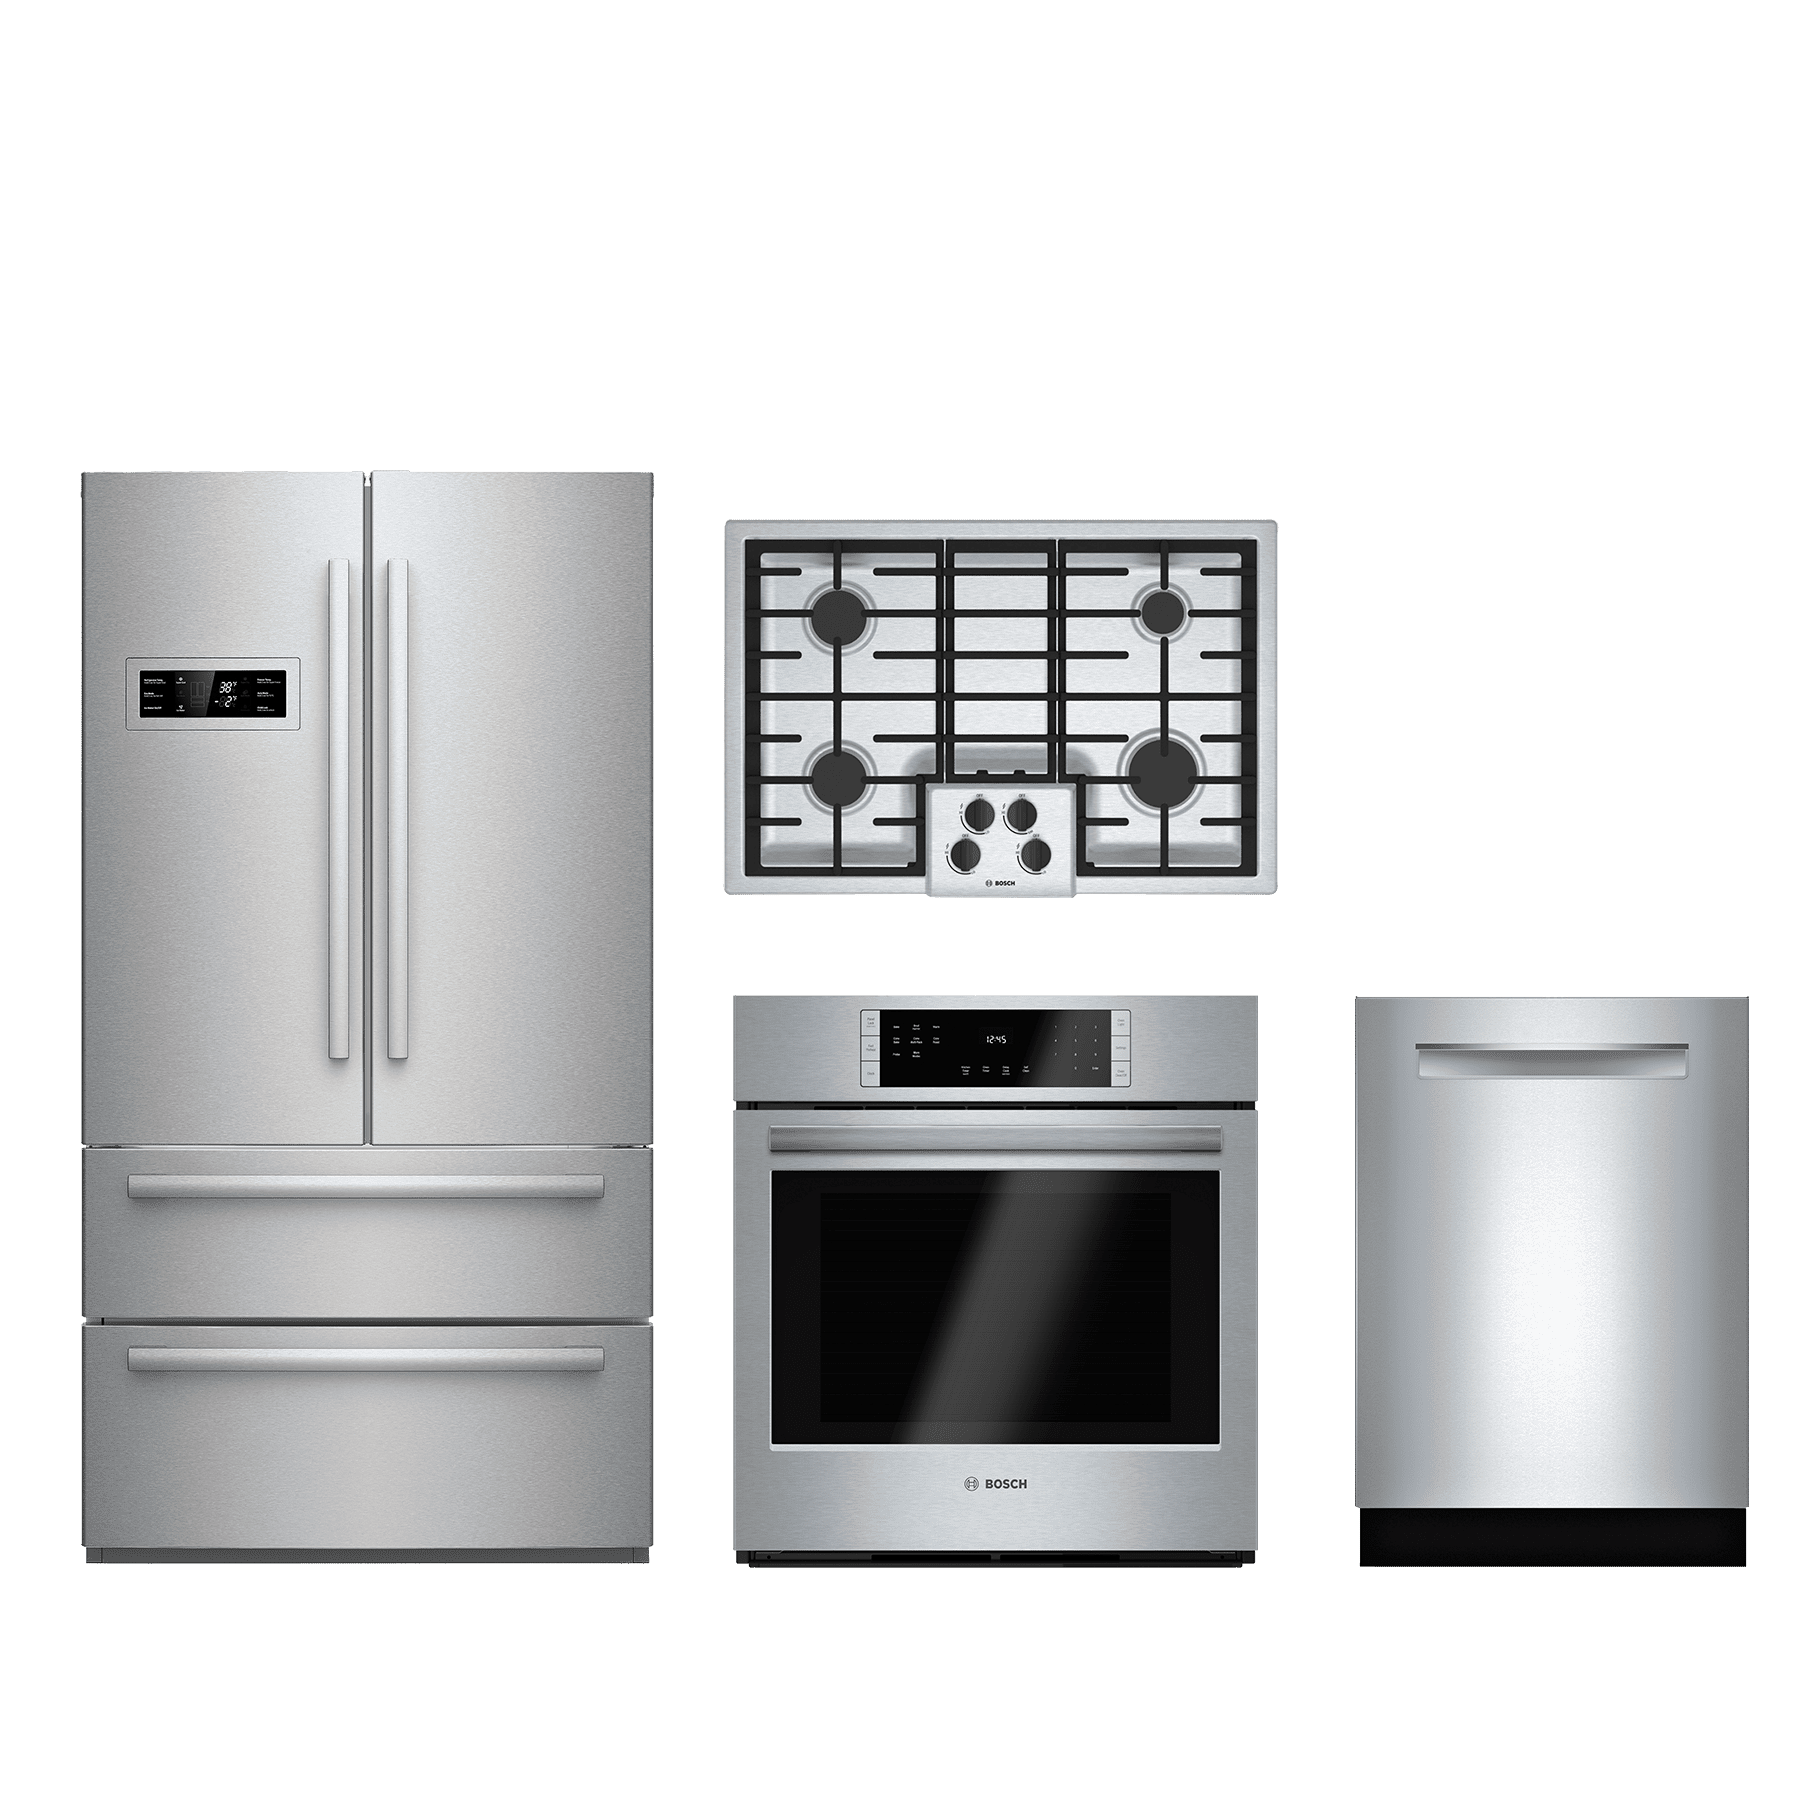 Bosch 4 Piece Kitchen Package Stainless Steel Bokitngm5055uc